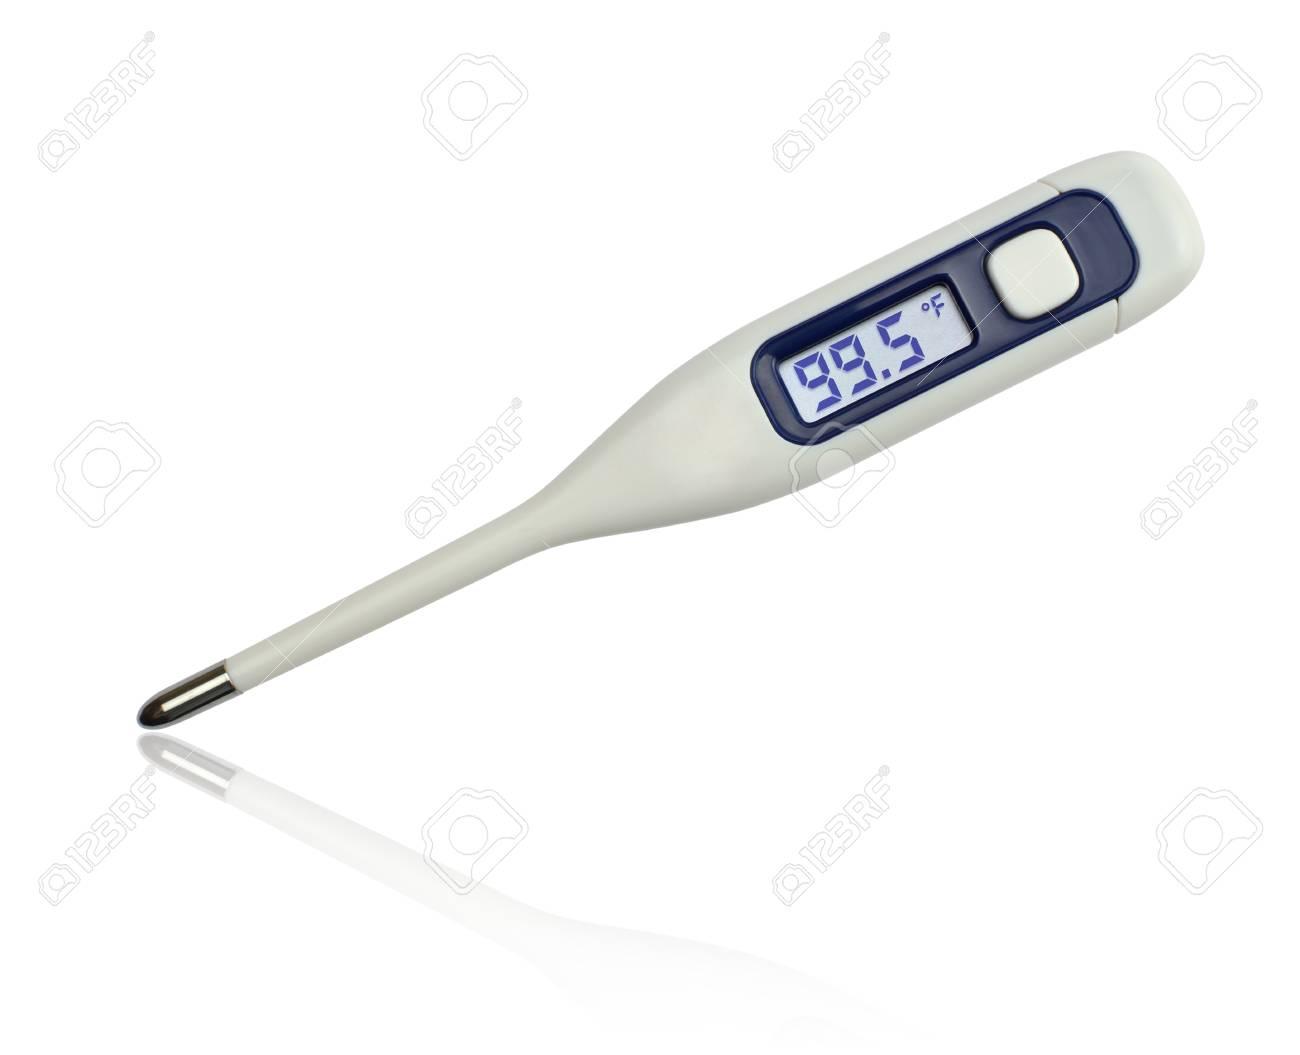 99 5 Grados Fahrenheit En El Termometro Electronico Clinico Sobre